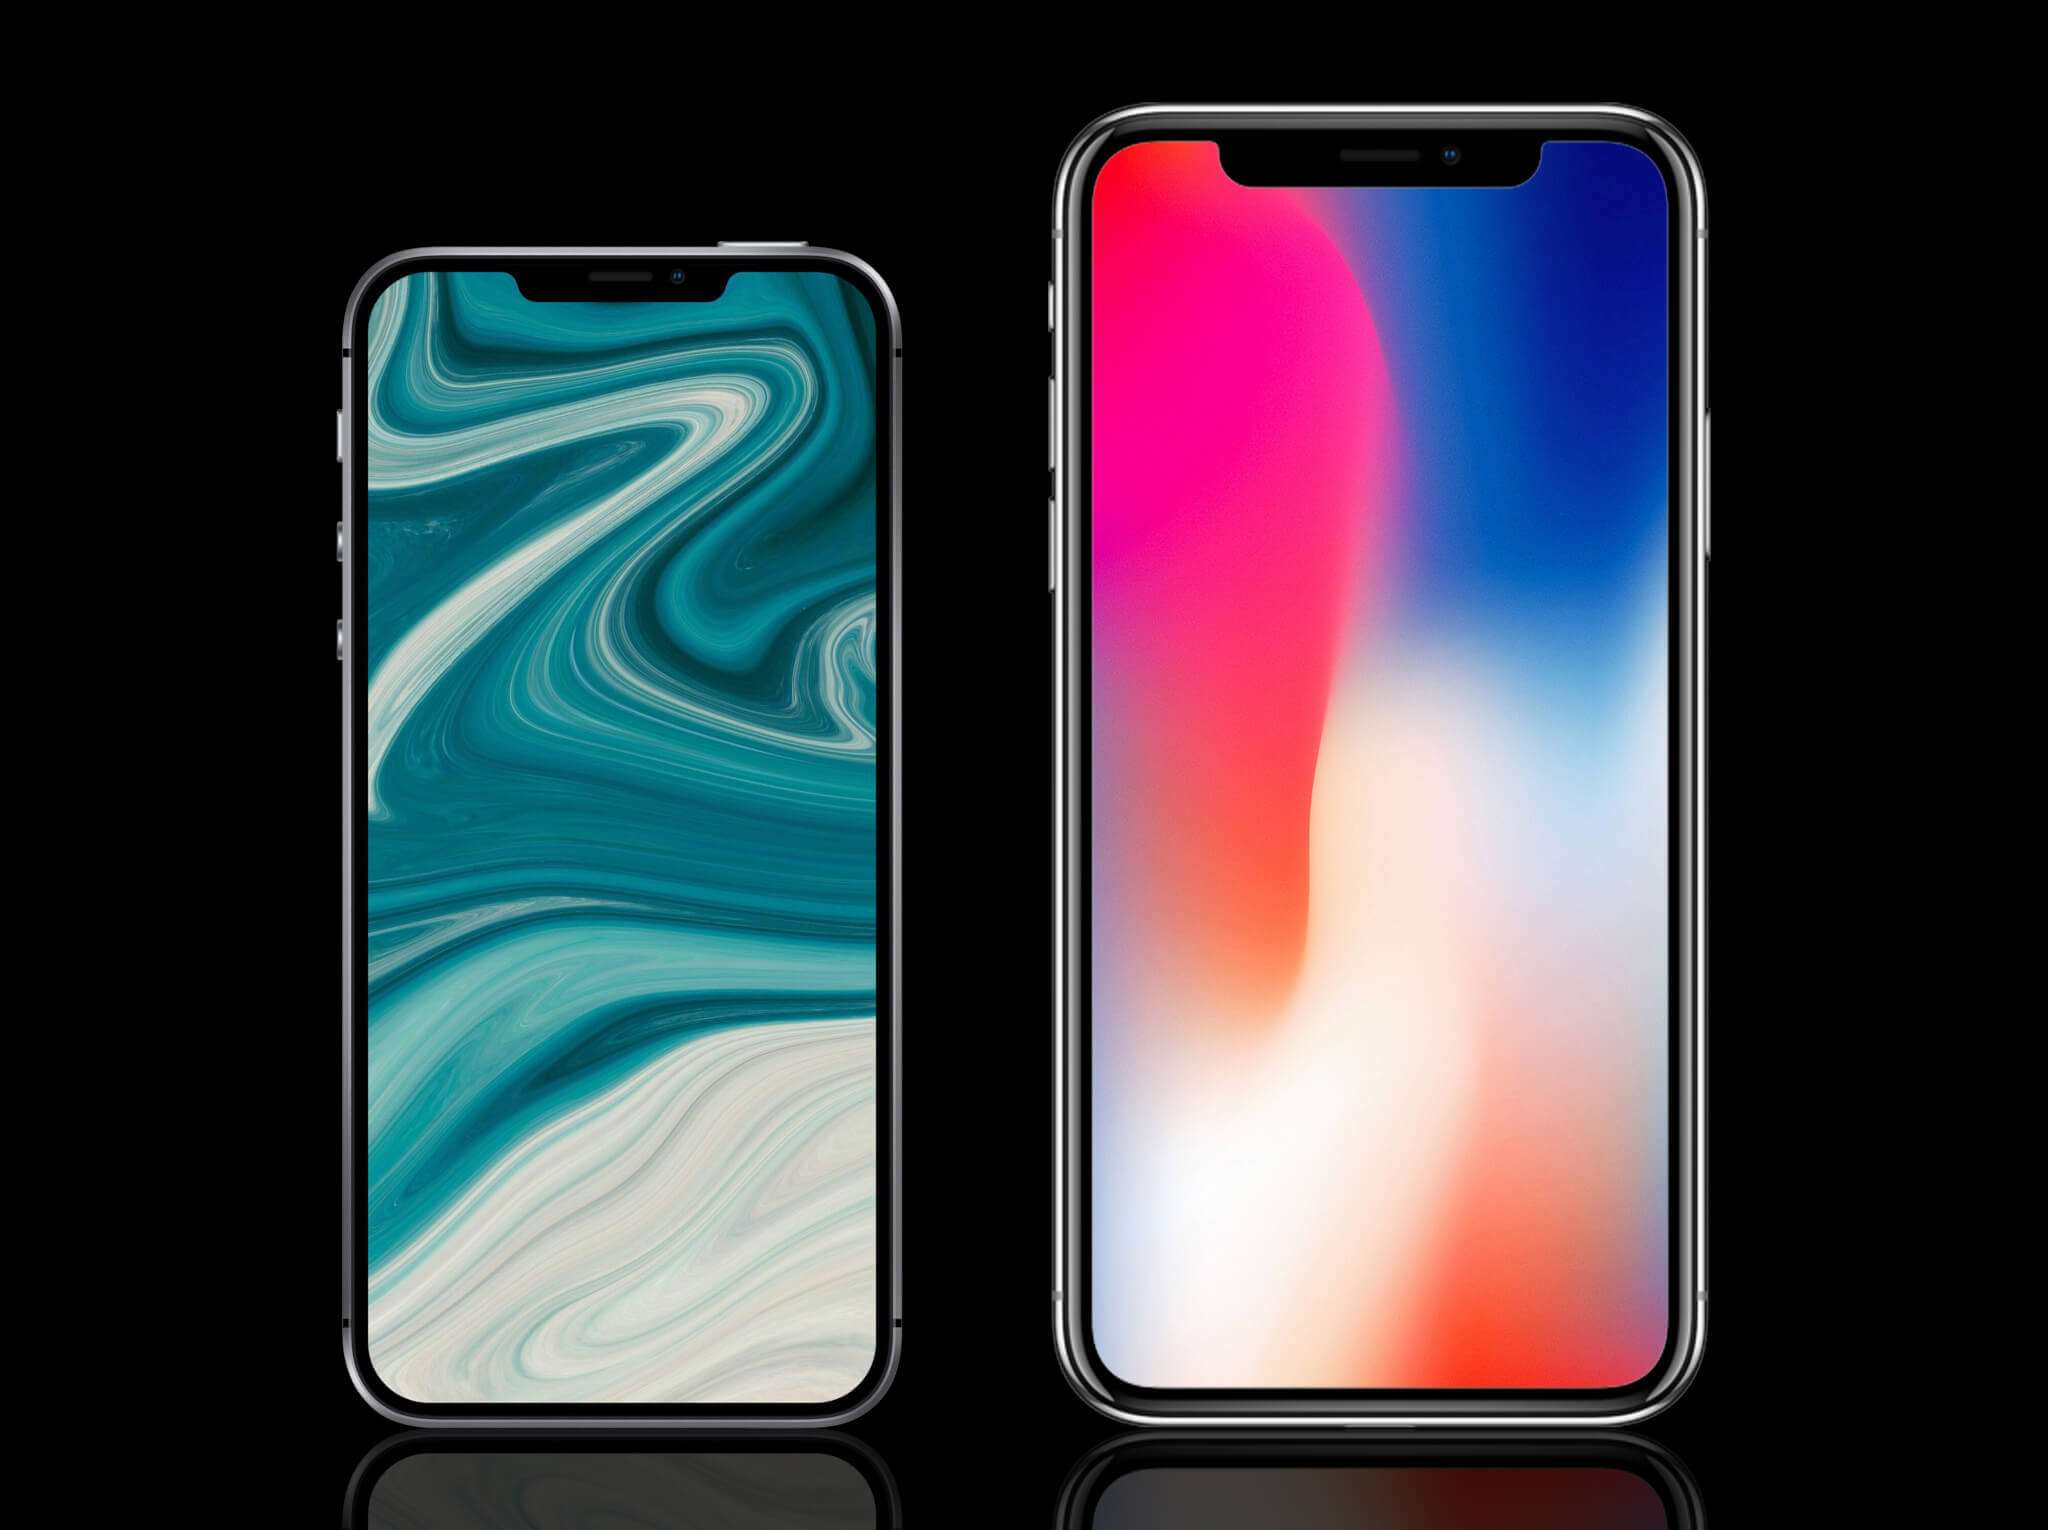 iPhone SE 2 - 2019 concept 001